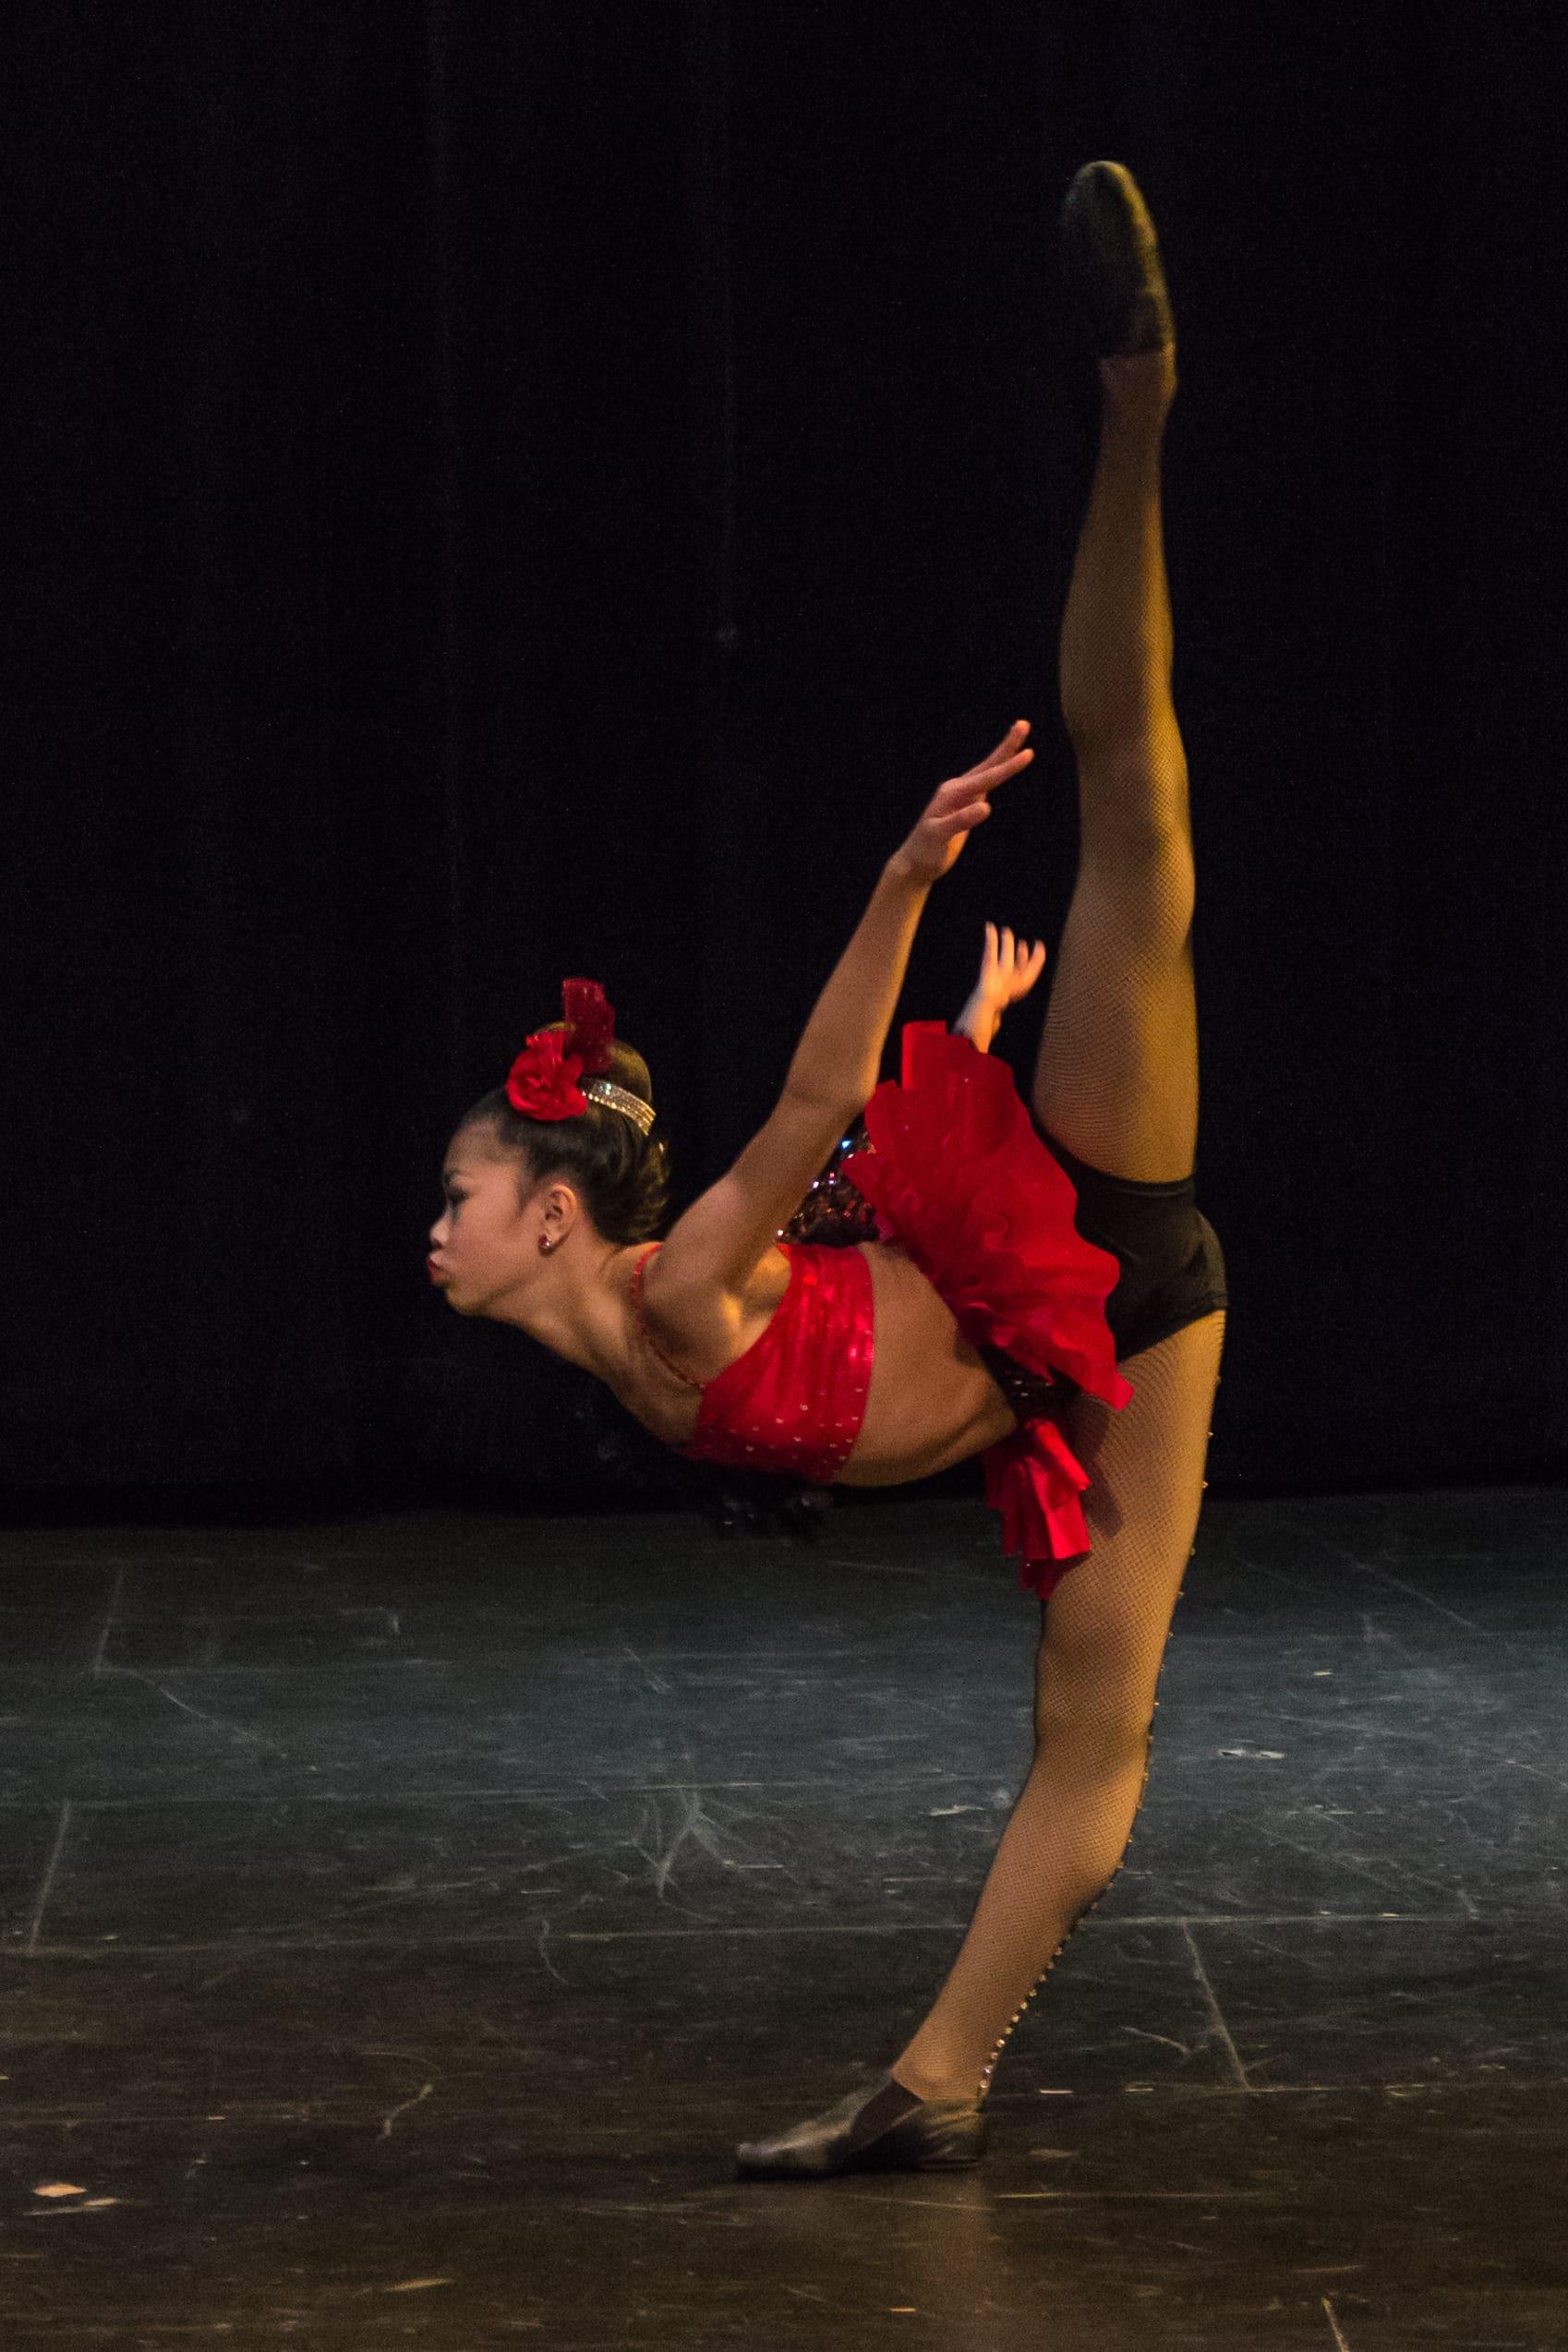 Enroll NOW for Fall Dance Classes! | DeKalb County Online